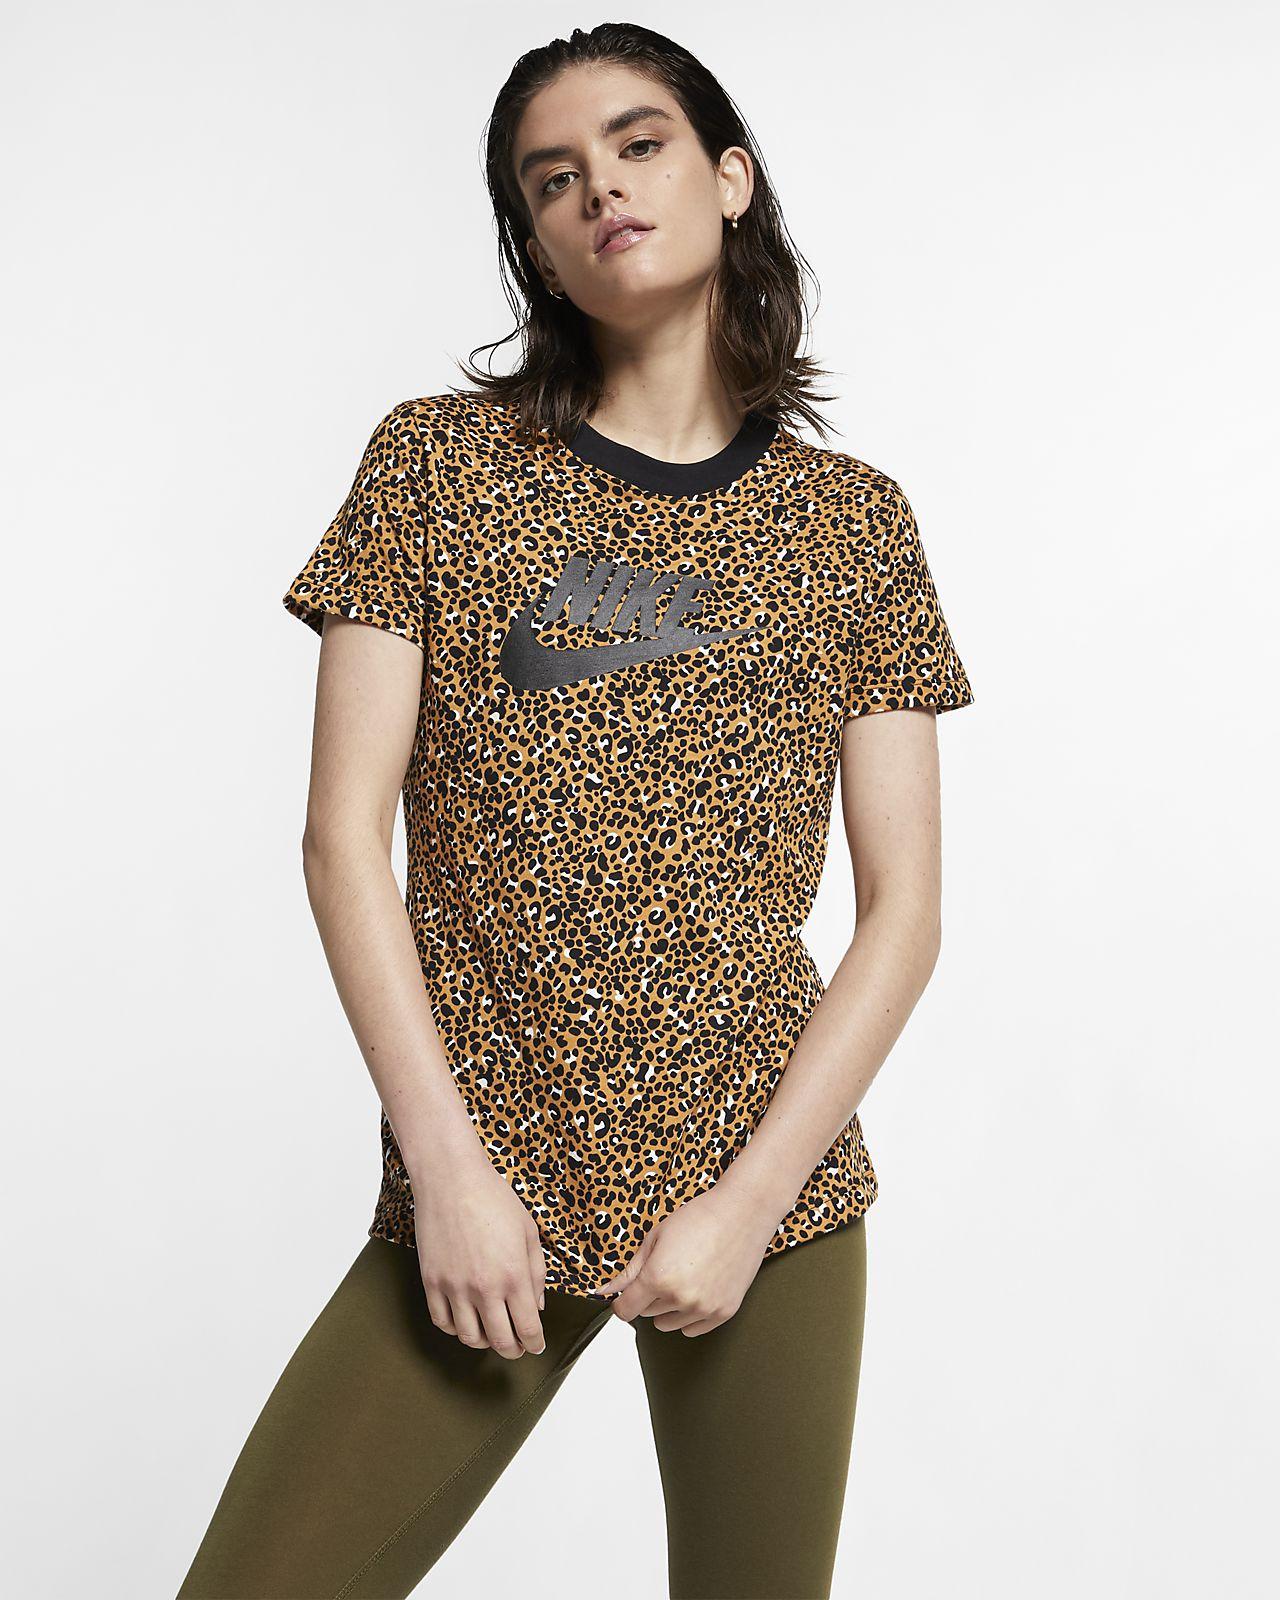 93387eab40 Nike Sportswear Animal Print Women's T-Shirt. Nike.com CH